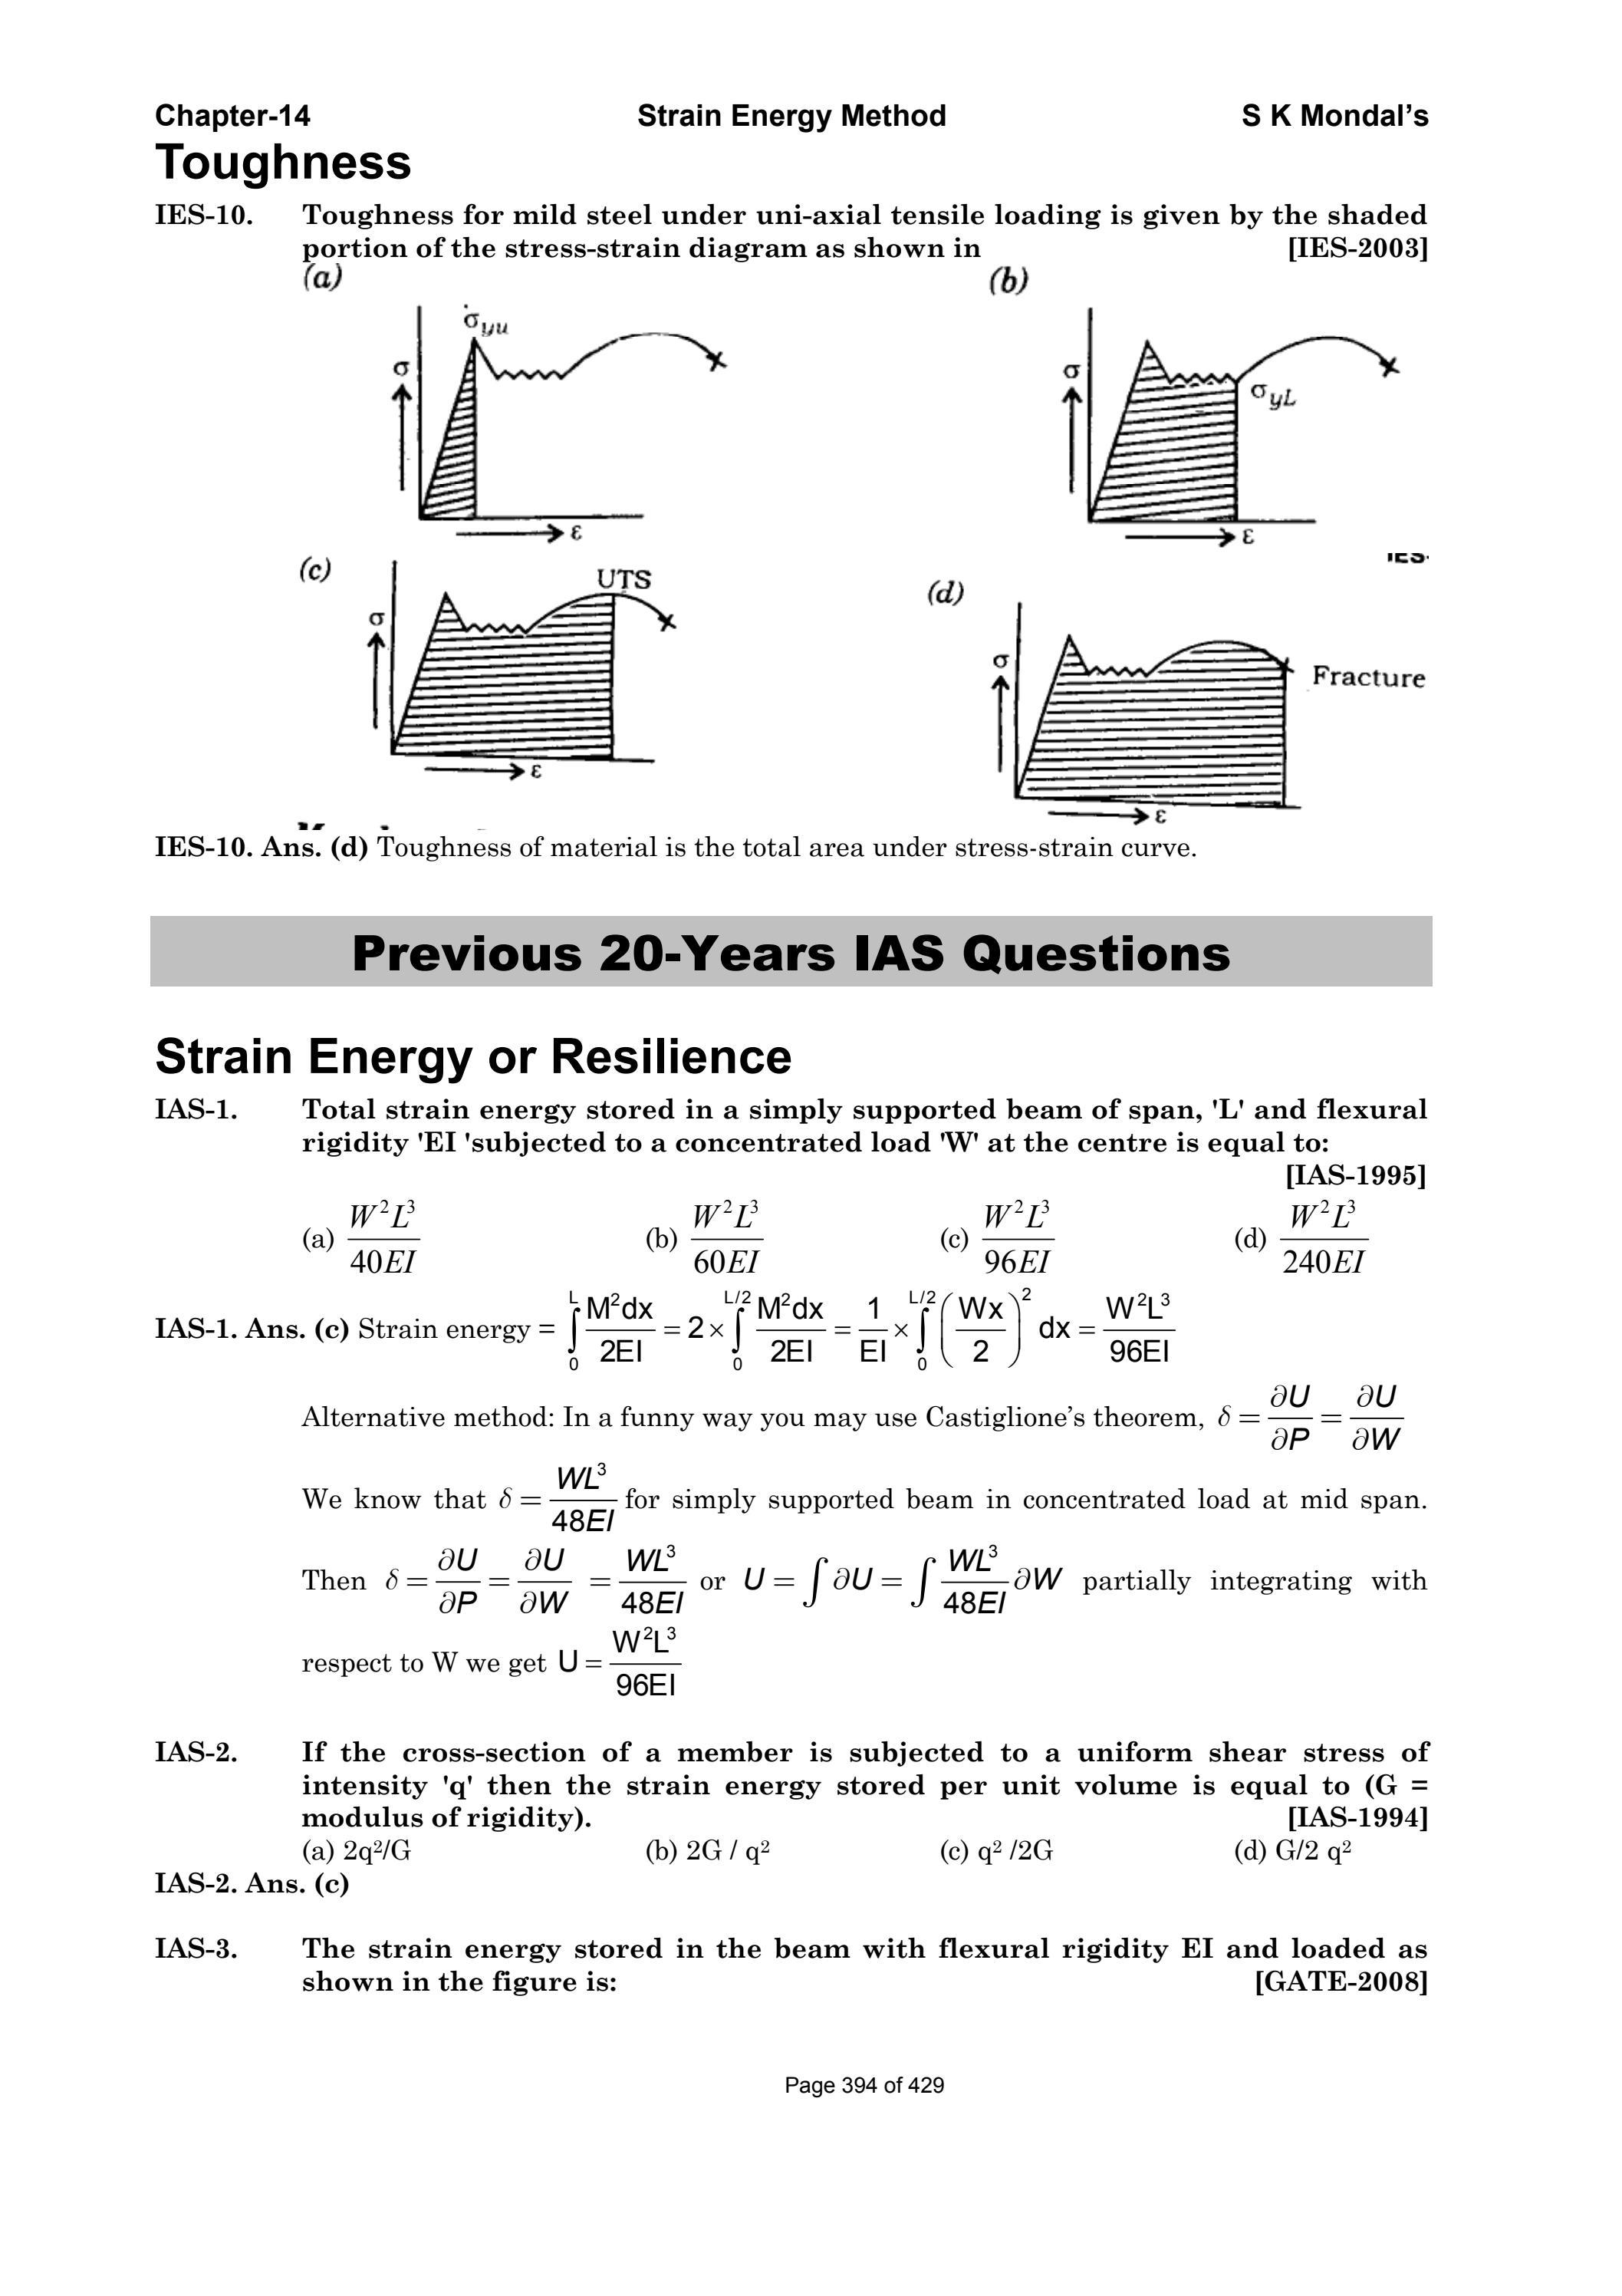 Strength Of Materials By S K Mondal Pdf Sdharmaraj Issuu Stress Vs Strain Diagram